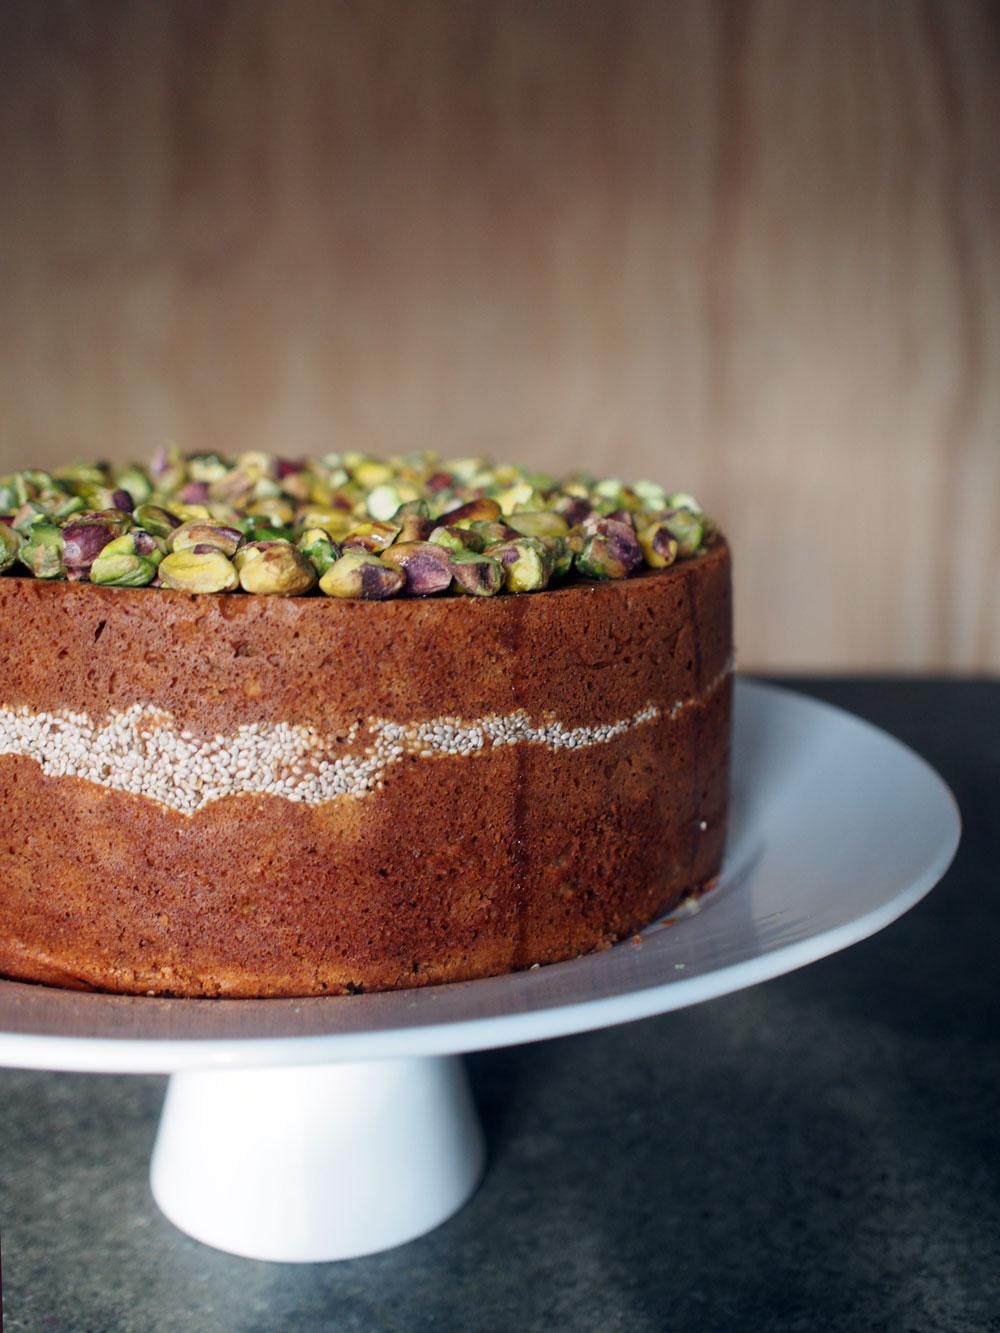 Clementine Chia Cake via Lila Wolff